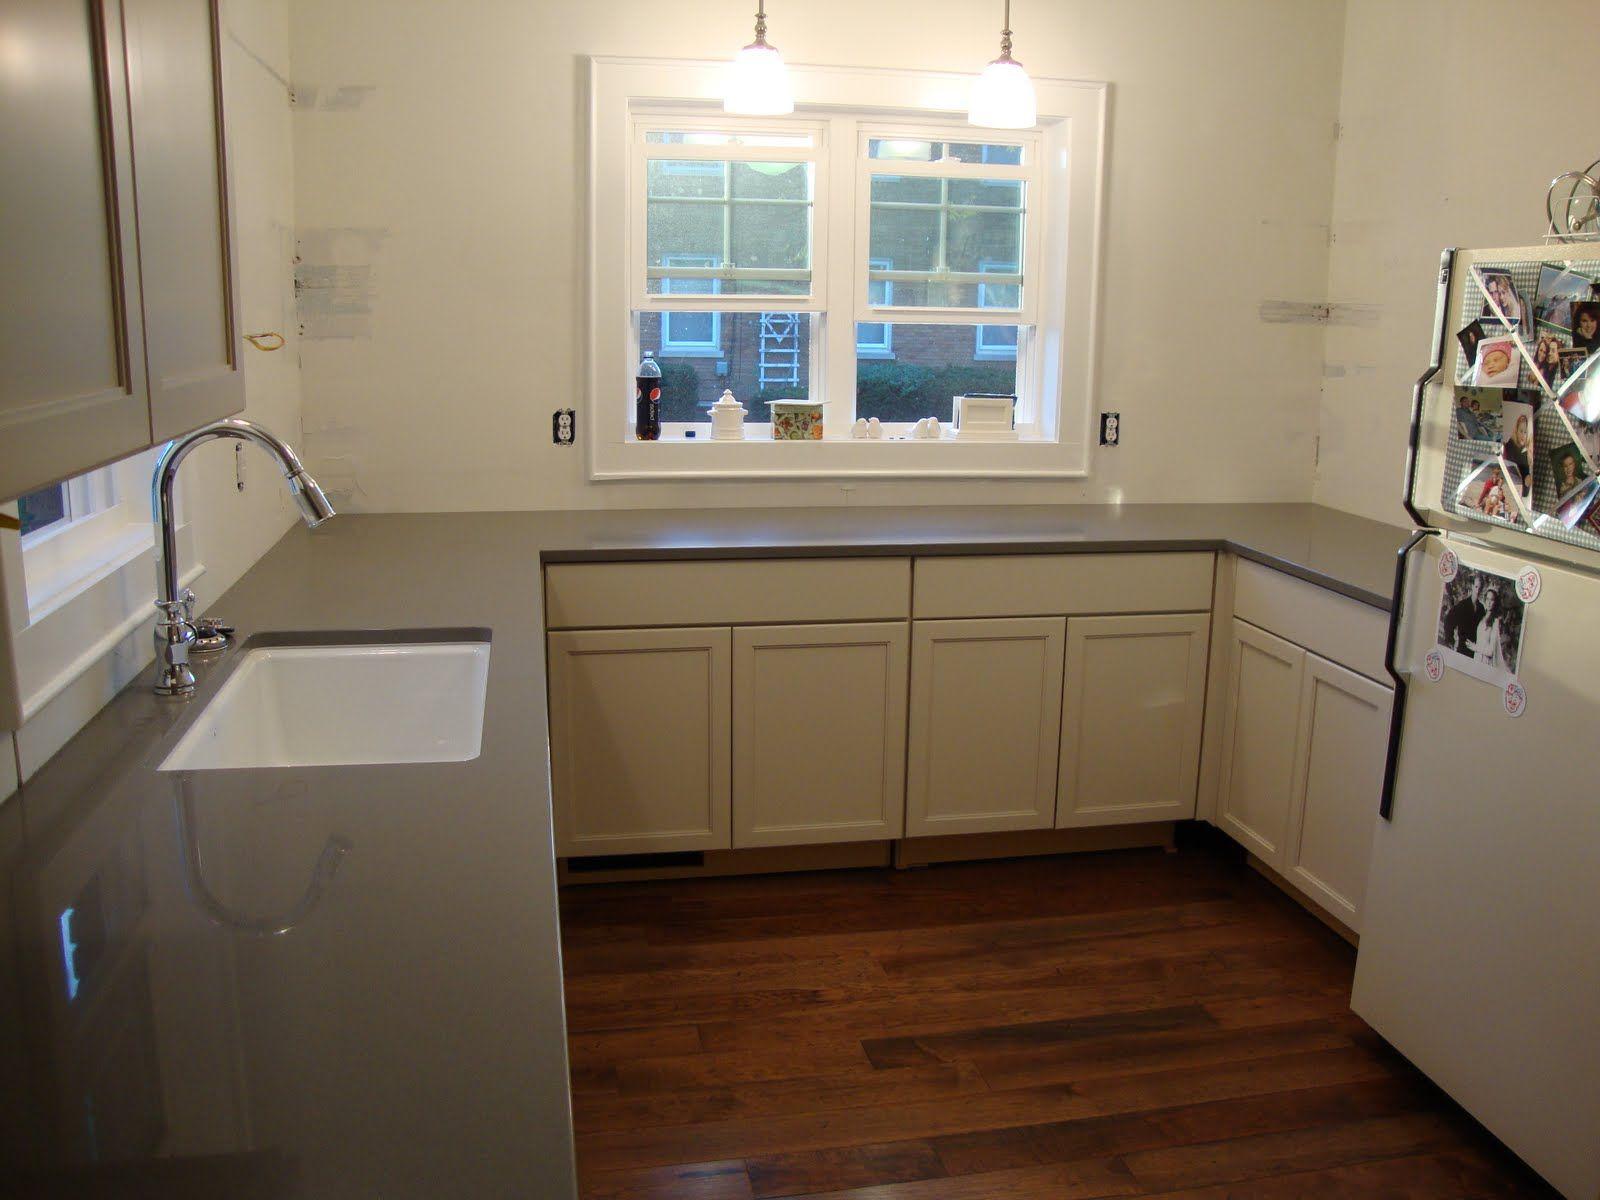 J&K Homestead: KitchenSilestone Quartz countertop in the color \